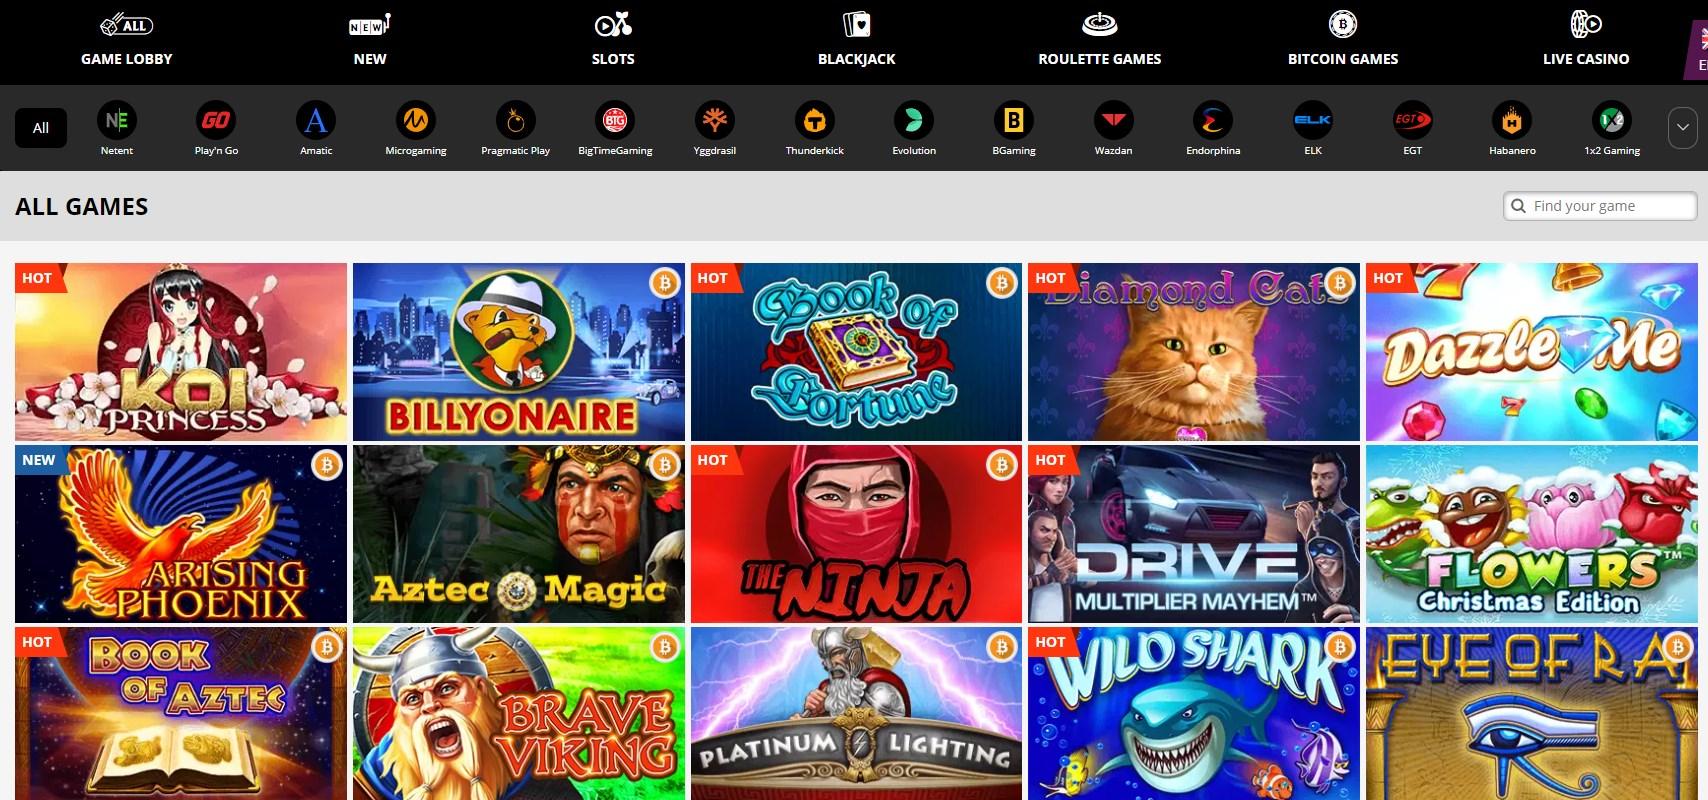 Playamo Games